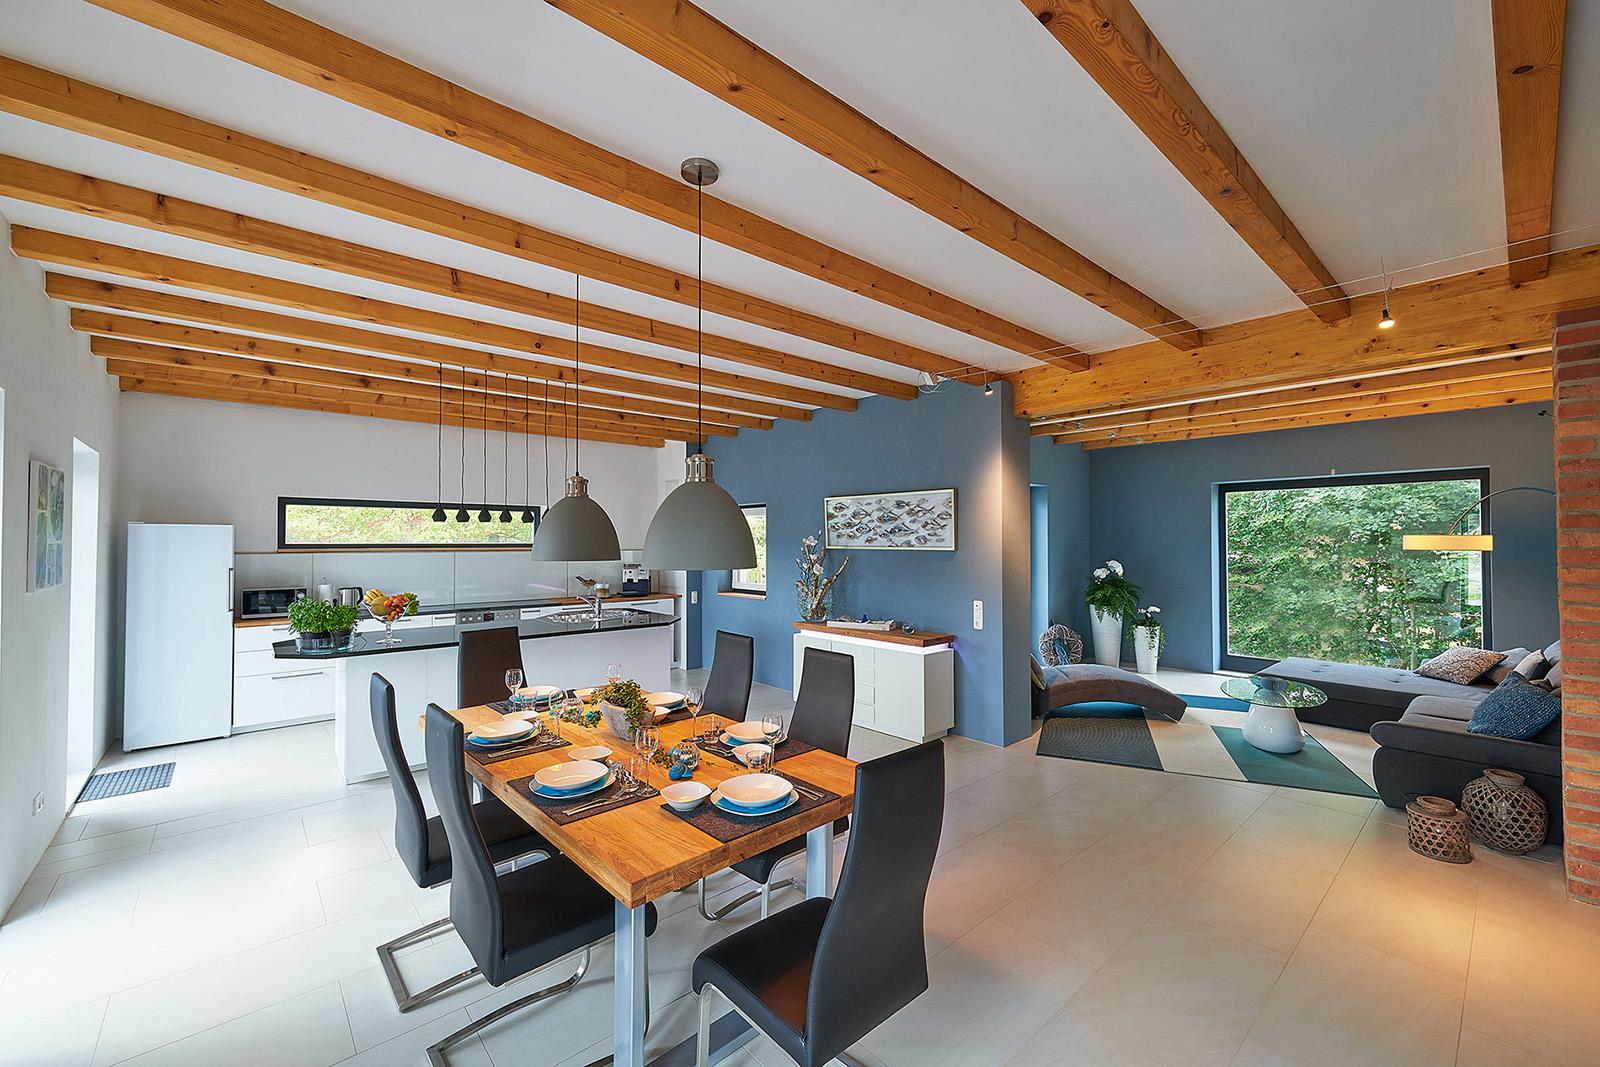 Fotodesign-matthias-schütz-ferienhaus-loft1